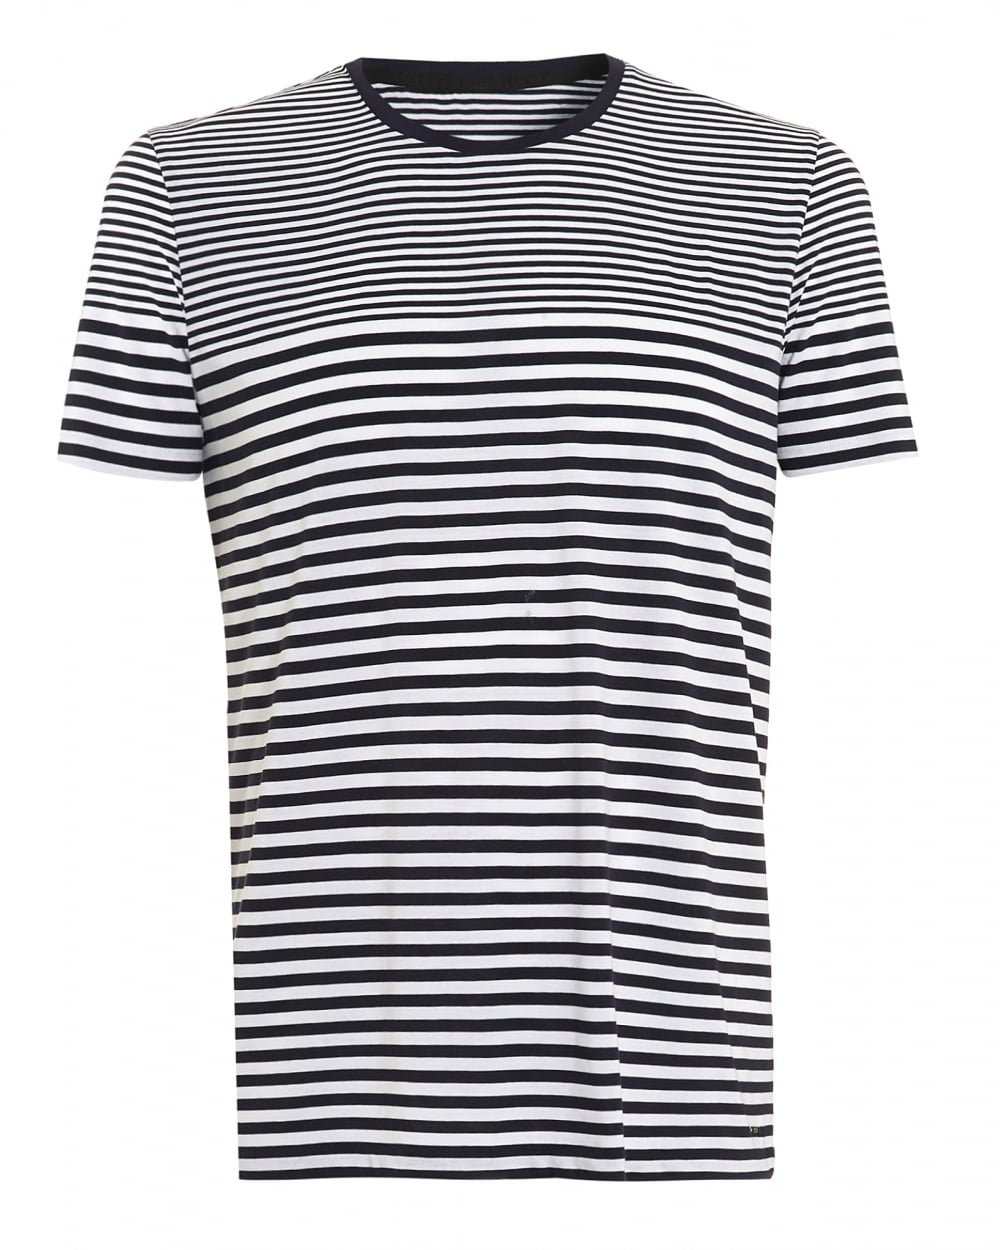 Hugo Boss Black Mens Tesser 49 Ws T Shirt Striped Navy